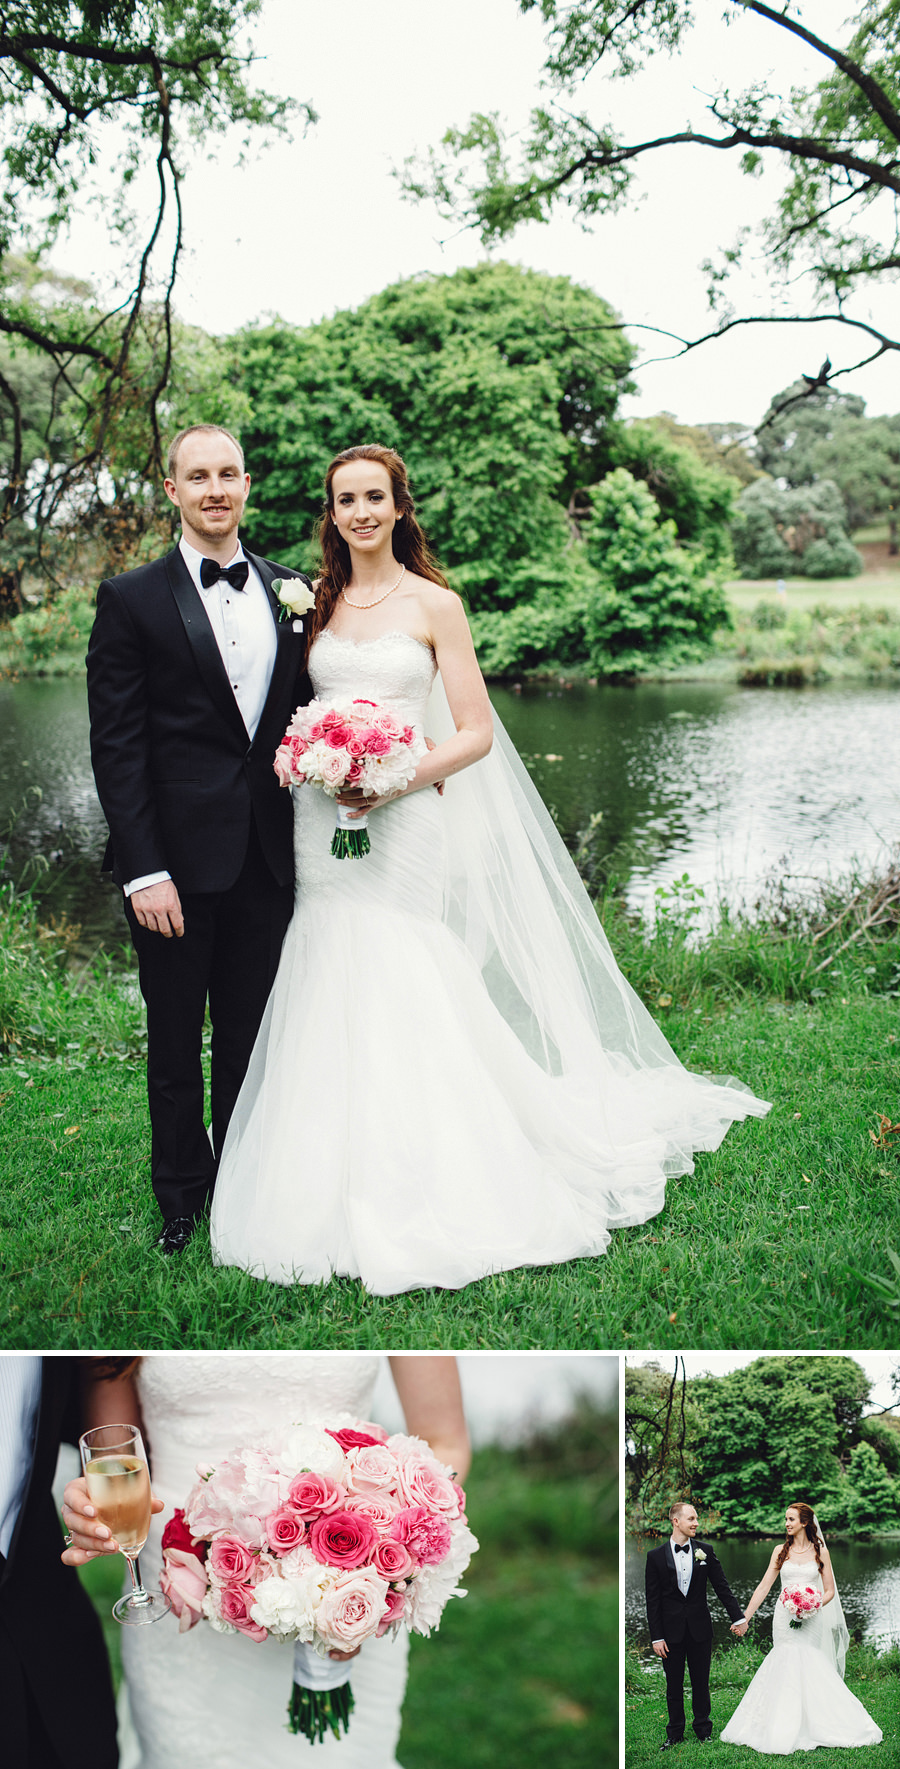 Centennial Park Wedding Photographer: Bridal Party Portraits